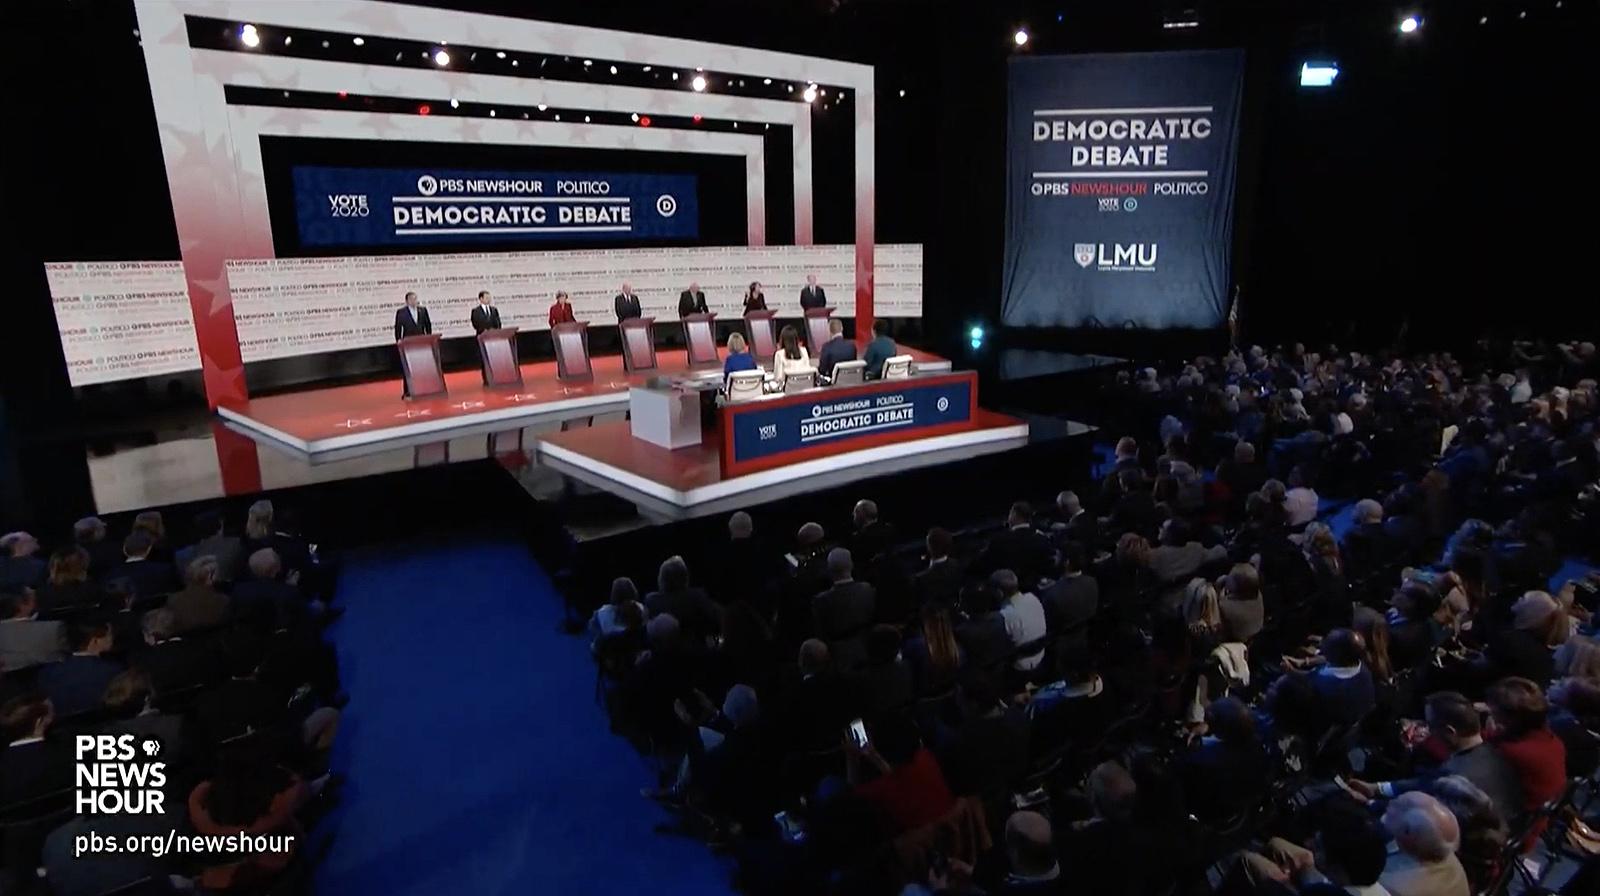 NCS_PBS-NewsHour_Politico_Democratic-Debate_008